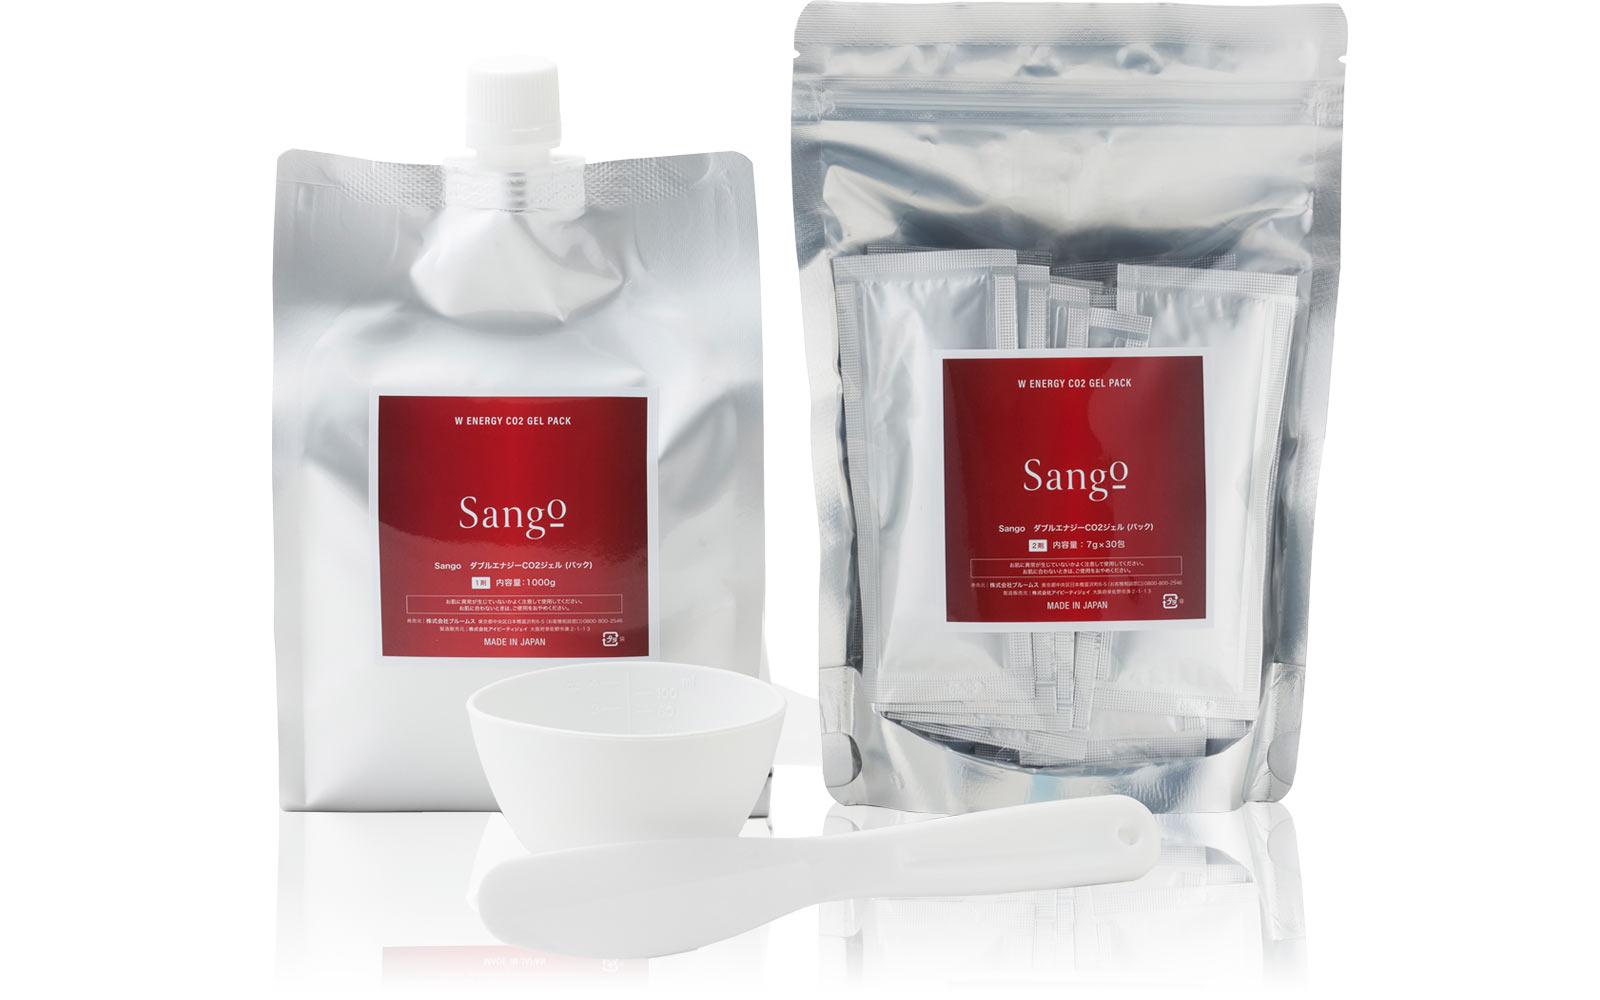 Sango W Energy CO2 Gel Pack